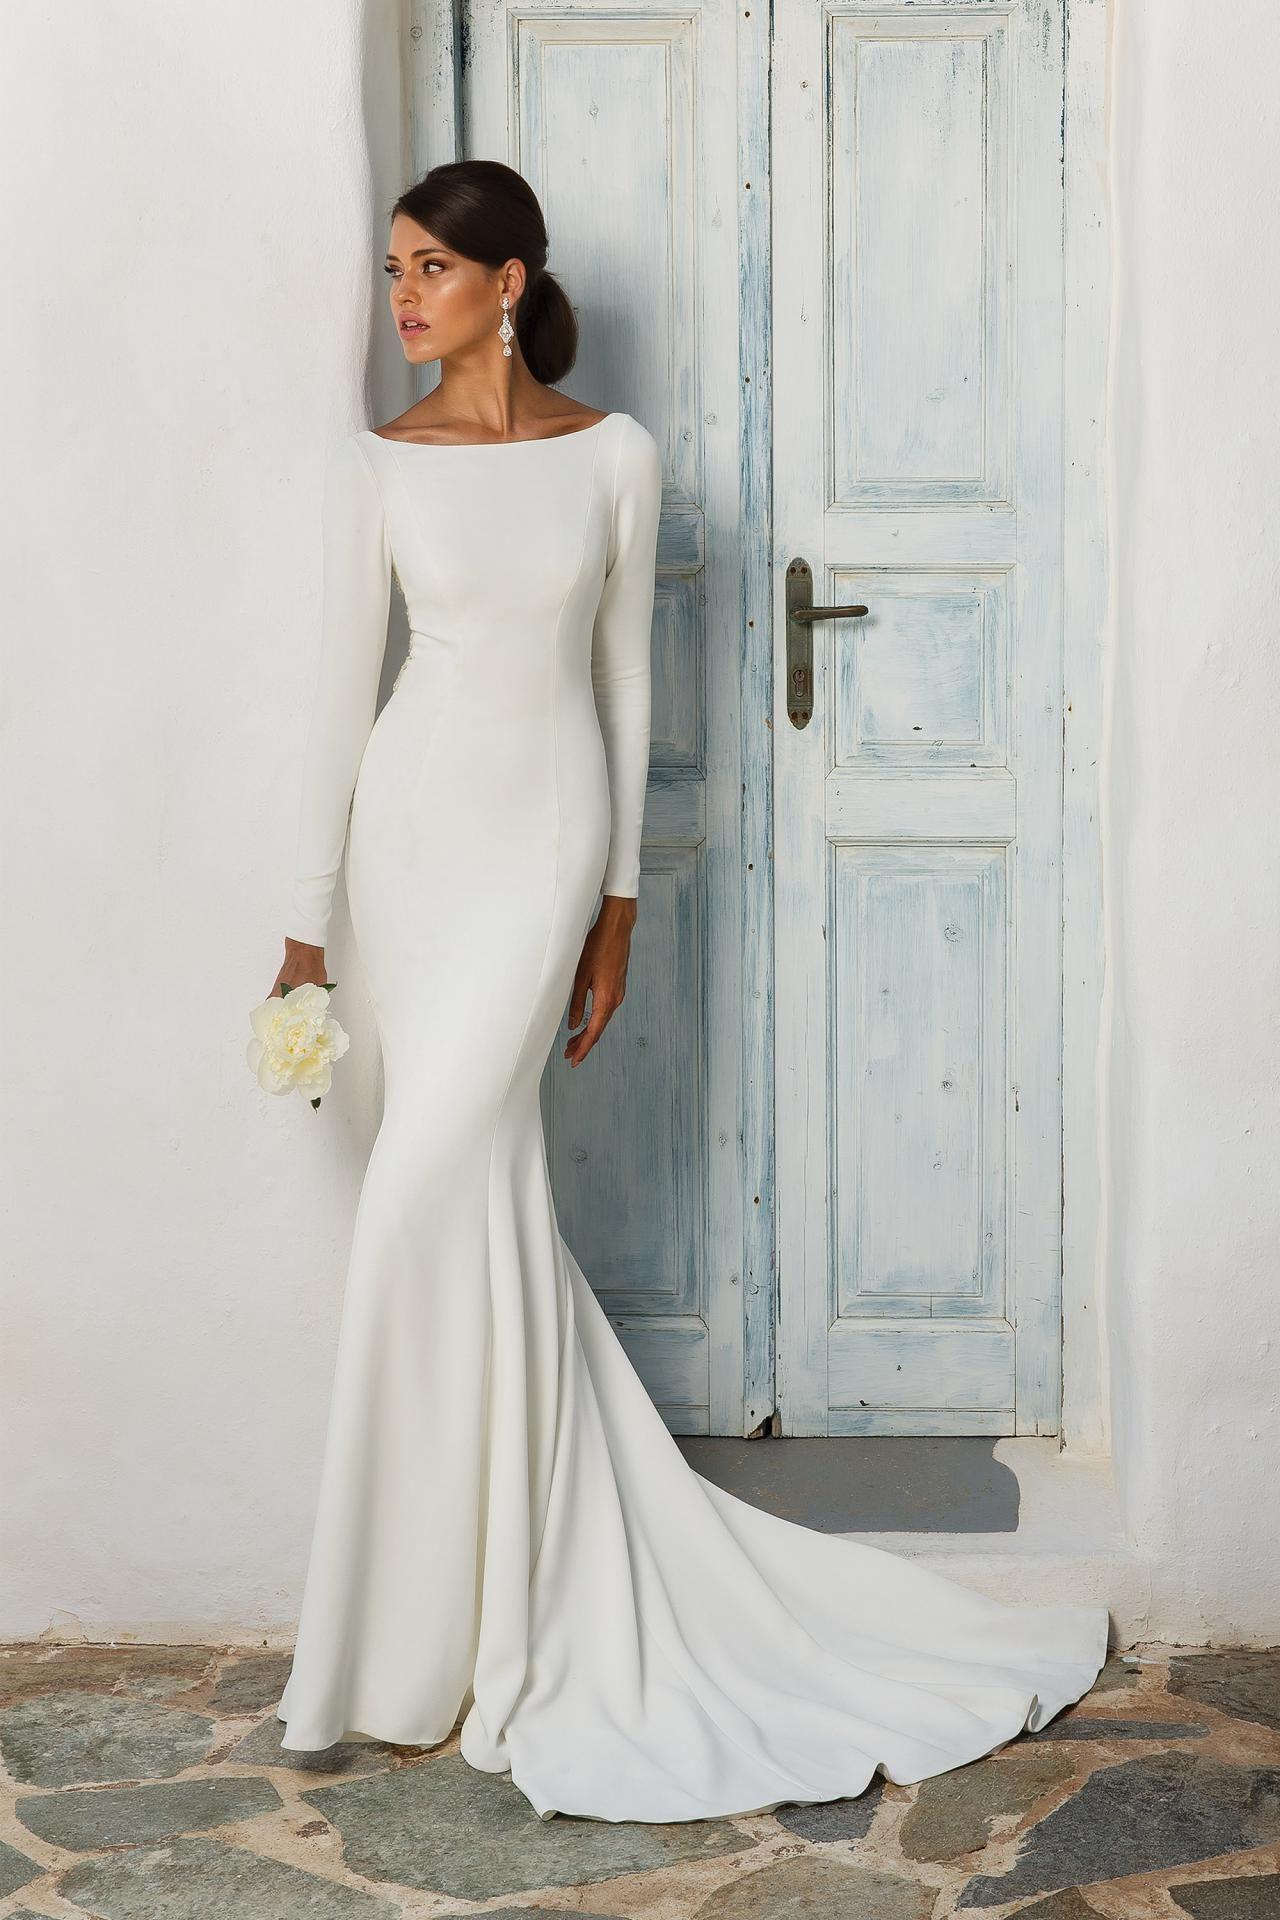 Unique White Satin Wedding DressLong Sleeves Bridal DressOpen Back